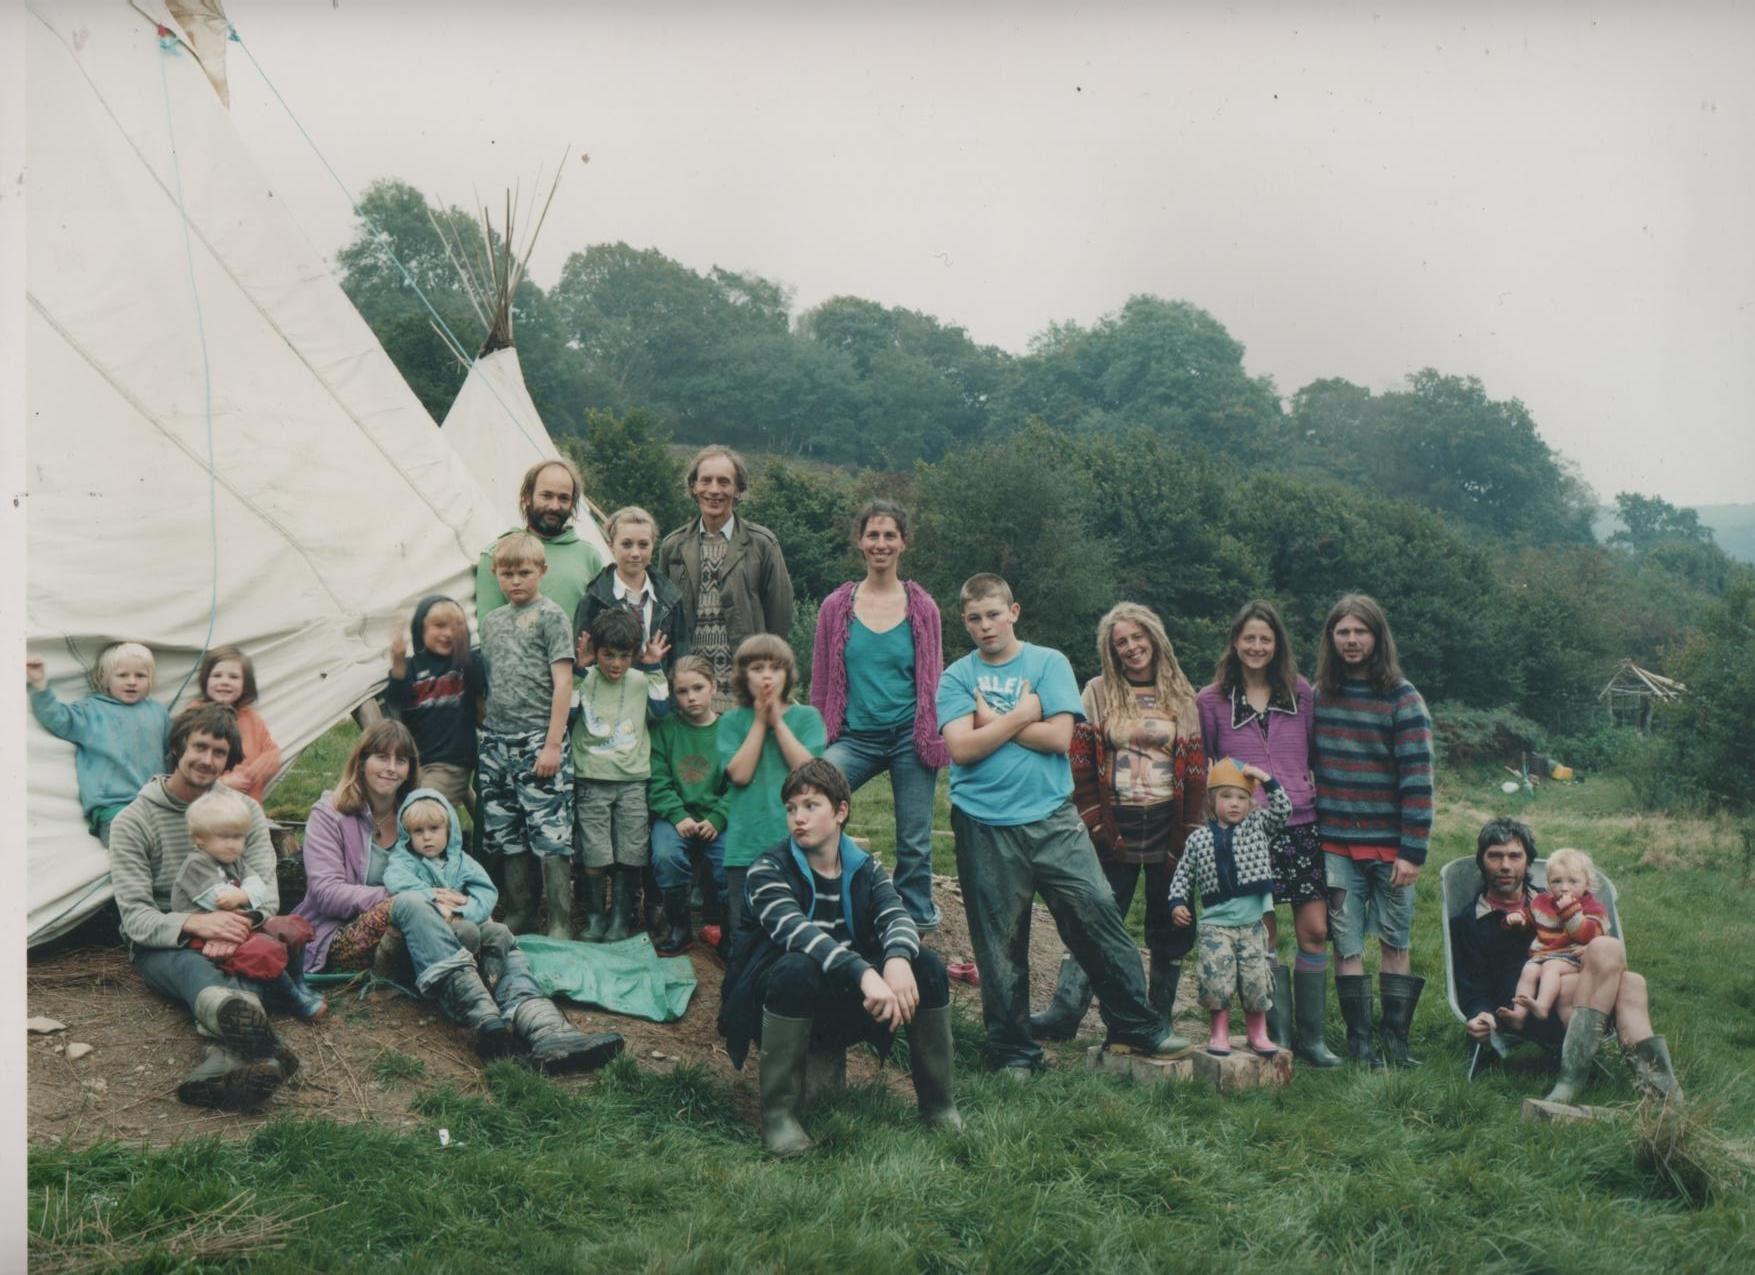 Still from Standing in Mud Tipi Valley Documentary